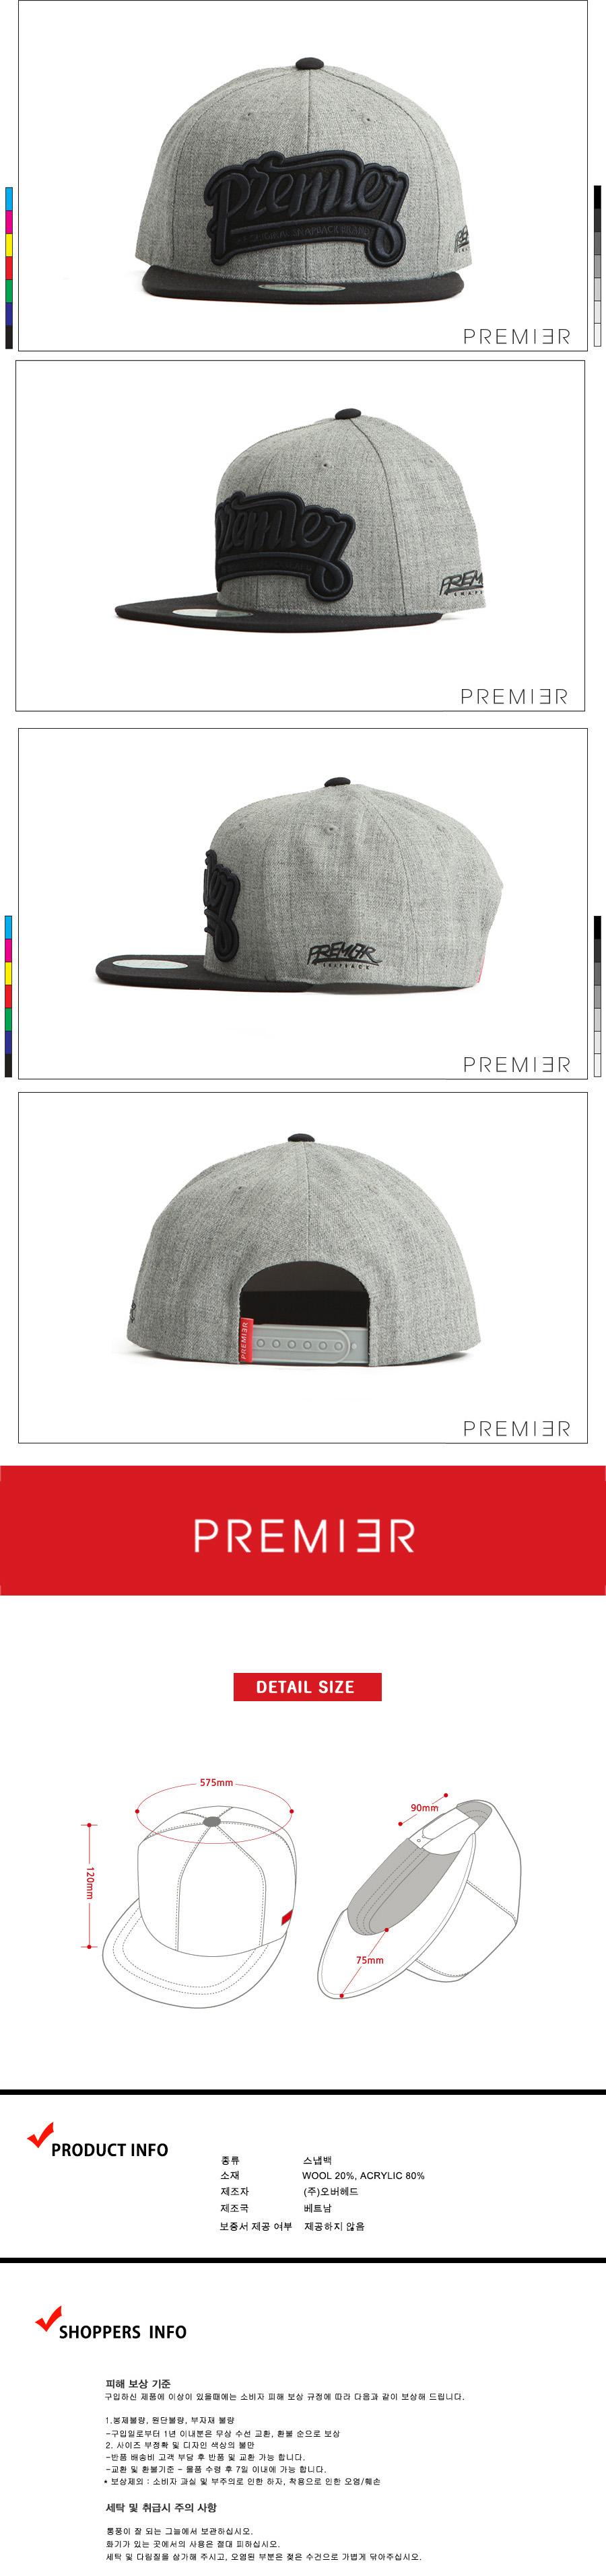 [ PREMIER ] [Premier] Snapback Cursive Logo Melange/Black (P762)